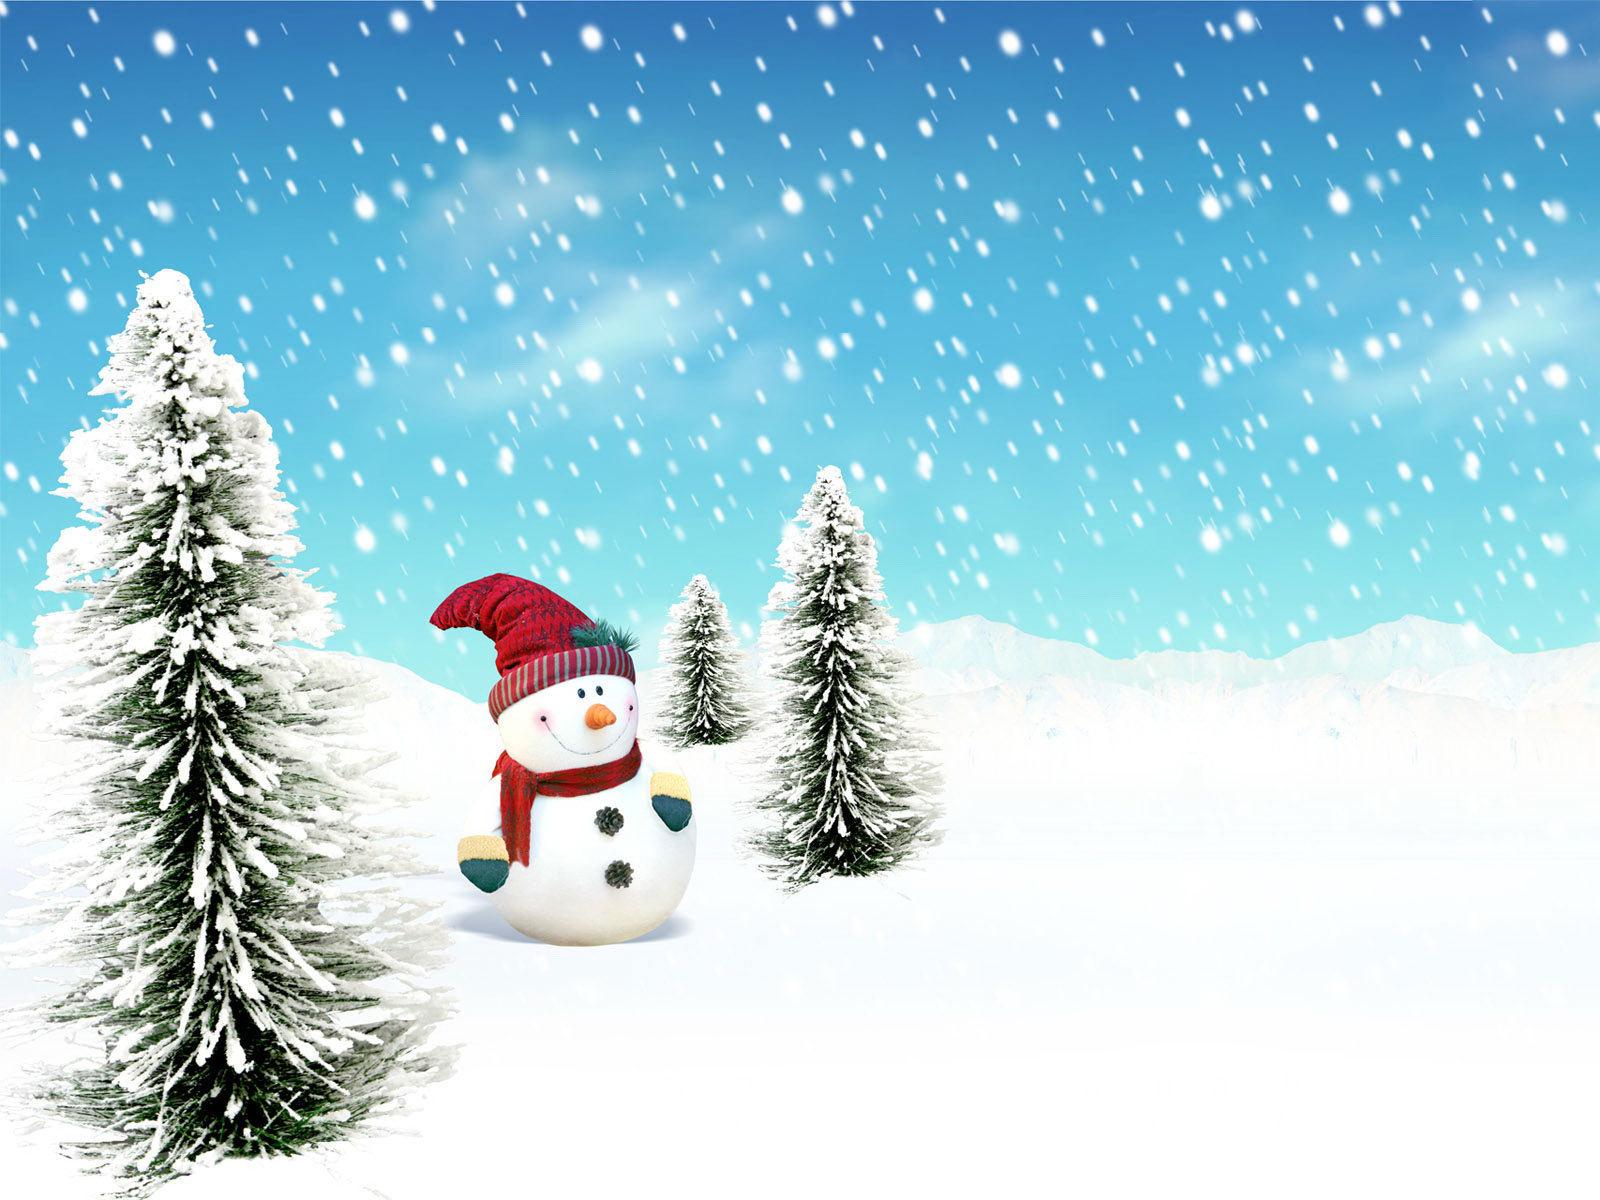 Snowman - Winter Photo (13347588) - Fanpop